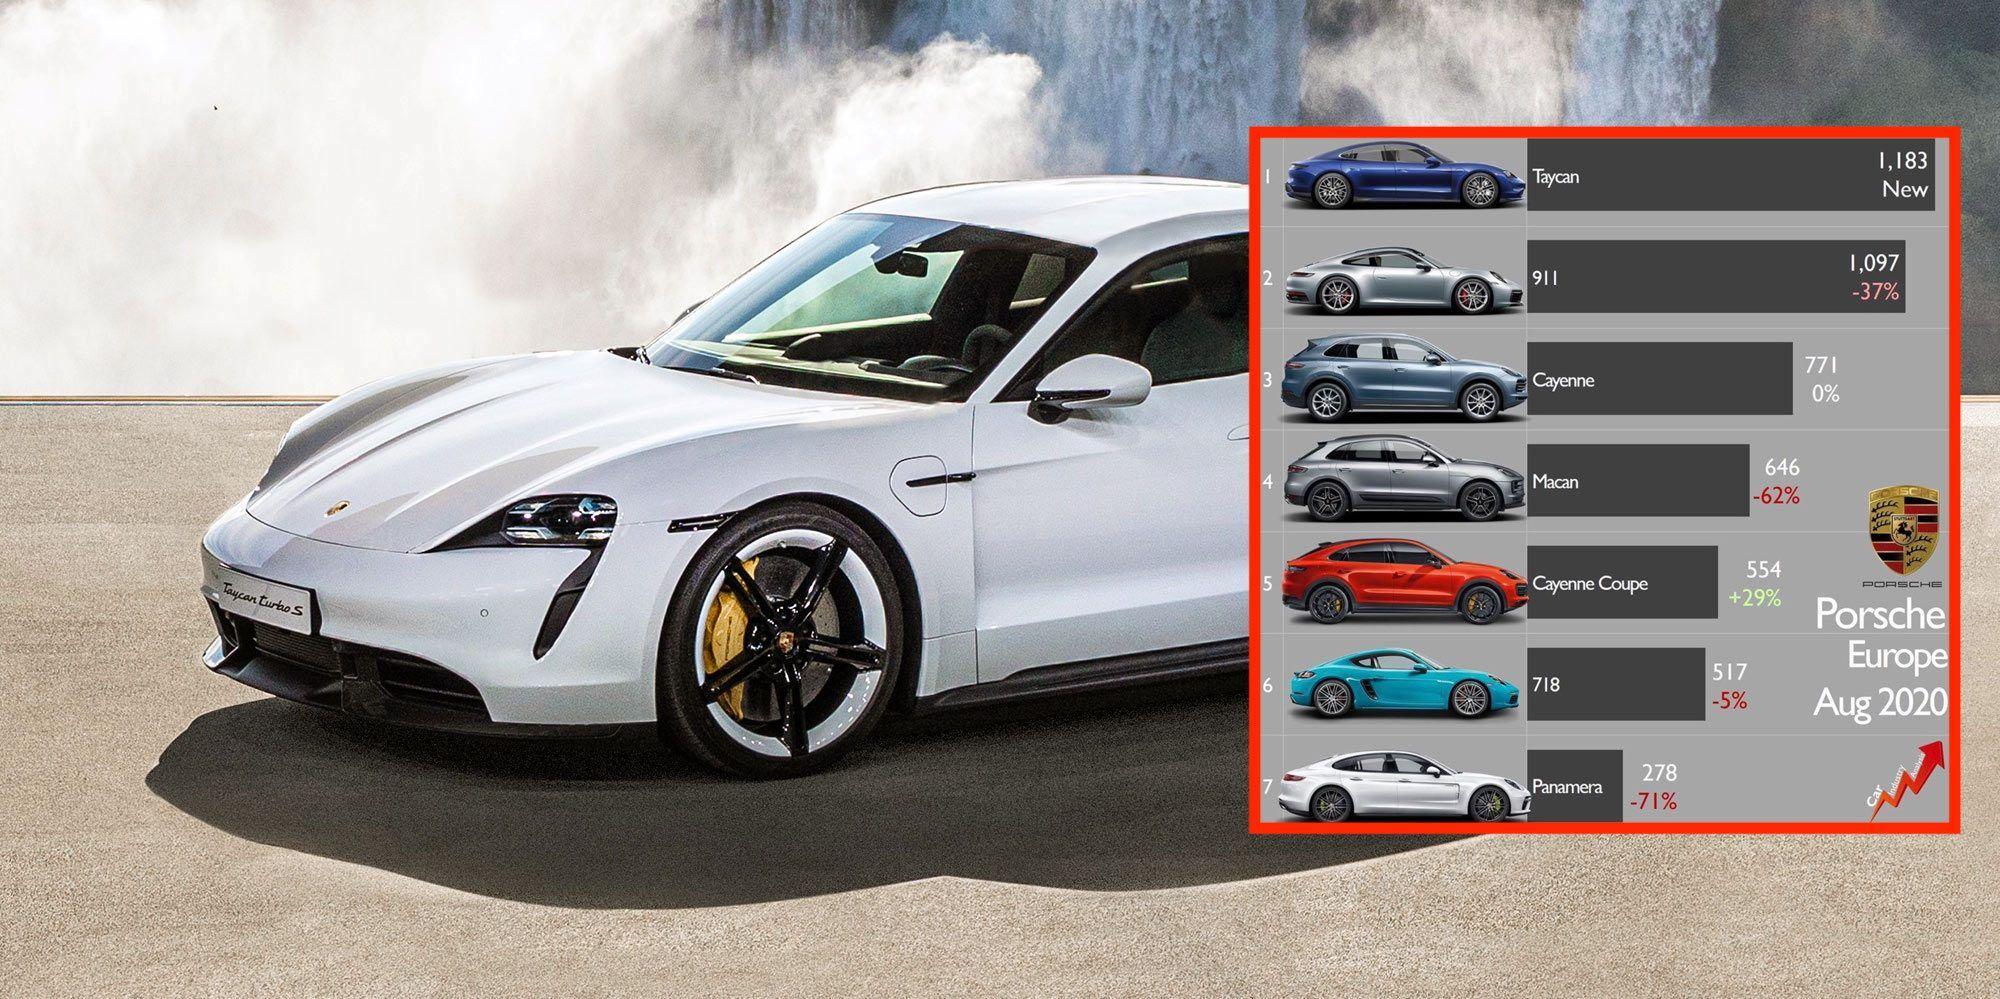 Taycan Electric Car Is Already Porsche S Best Selling Model Destroys Panamera Sales Https T Co A2ouc0m4ut By Fredericlambert Bjmt Porsche Electric Car Car